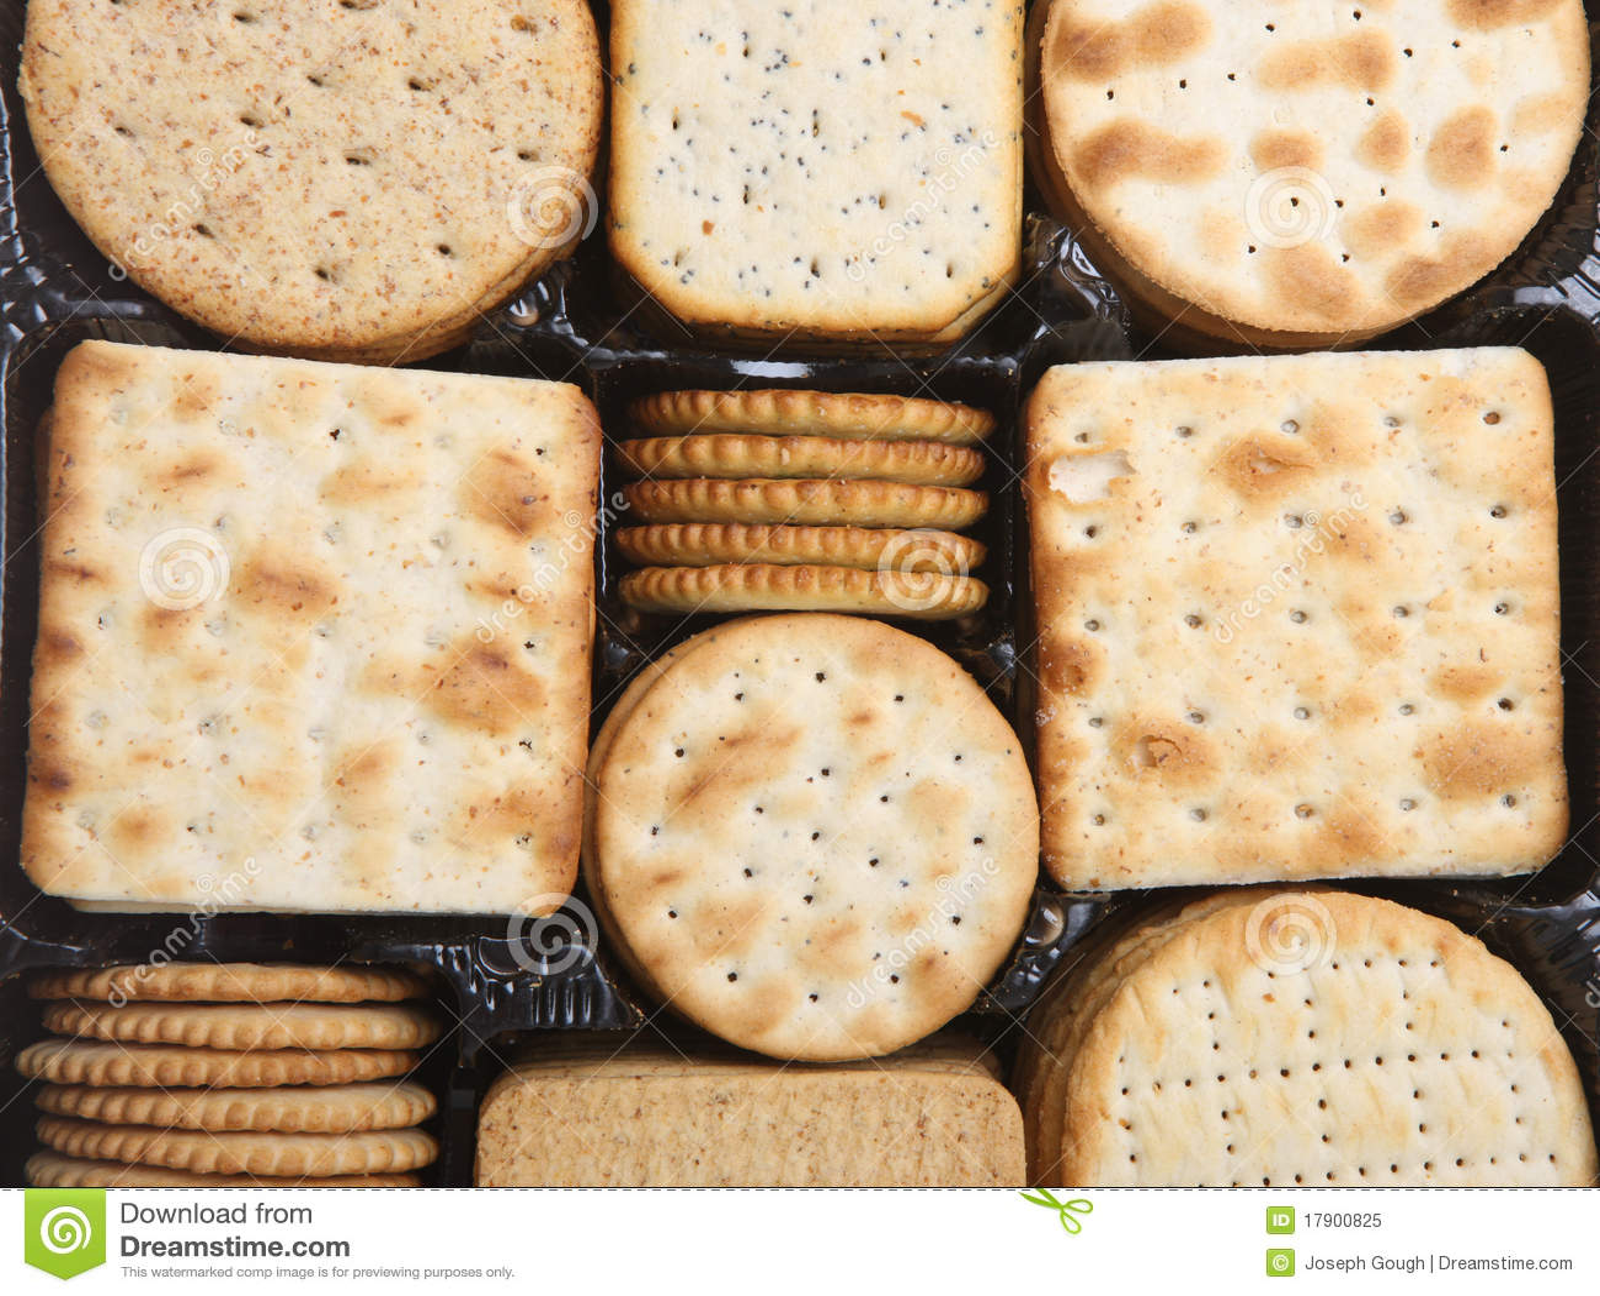 Image Result For Cracker Biscuits